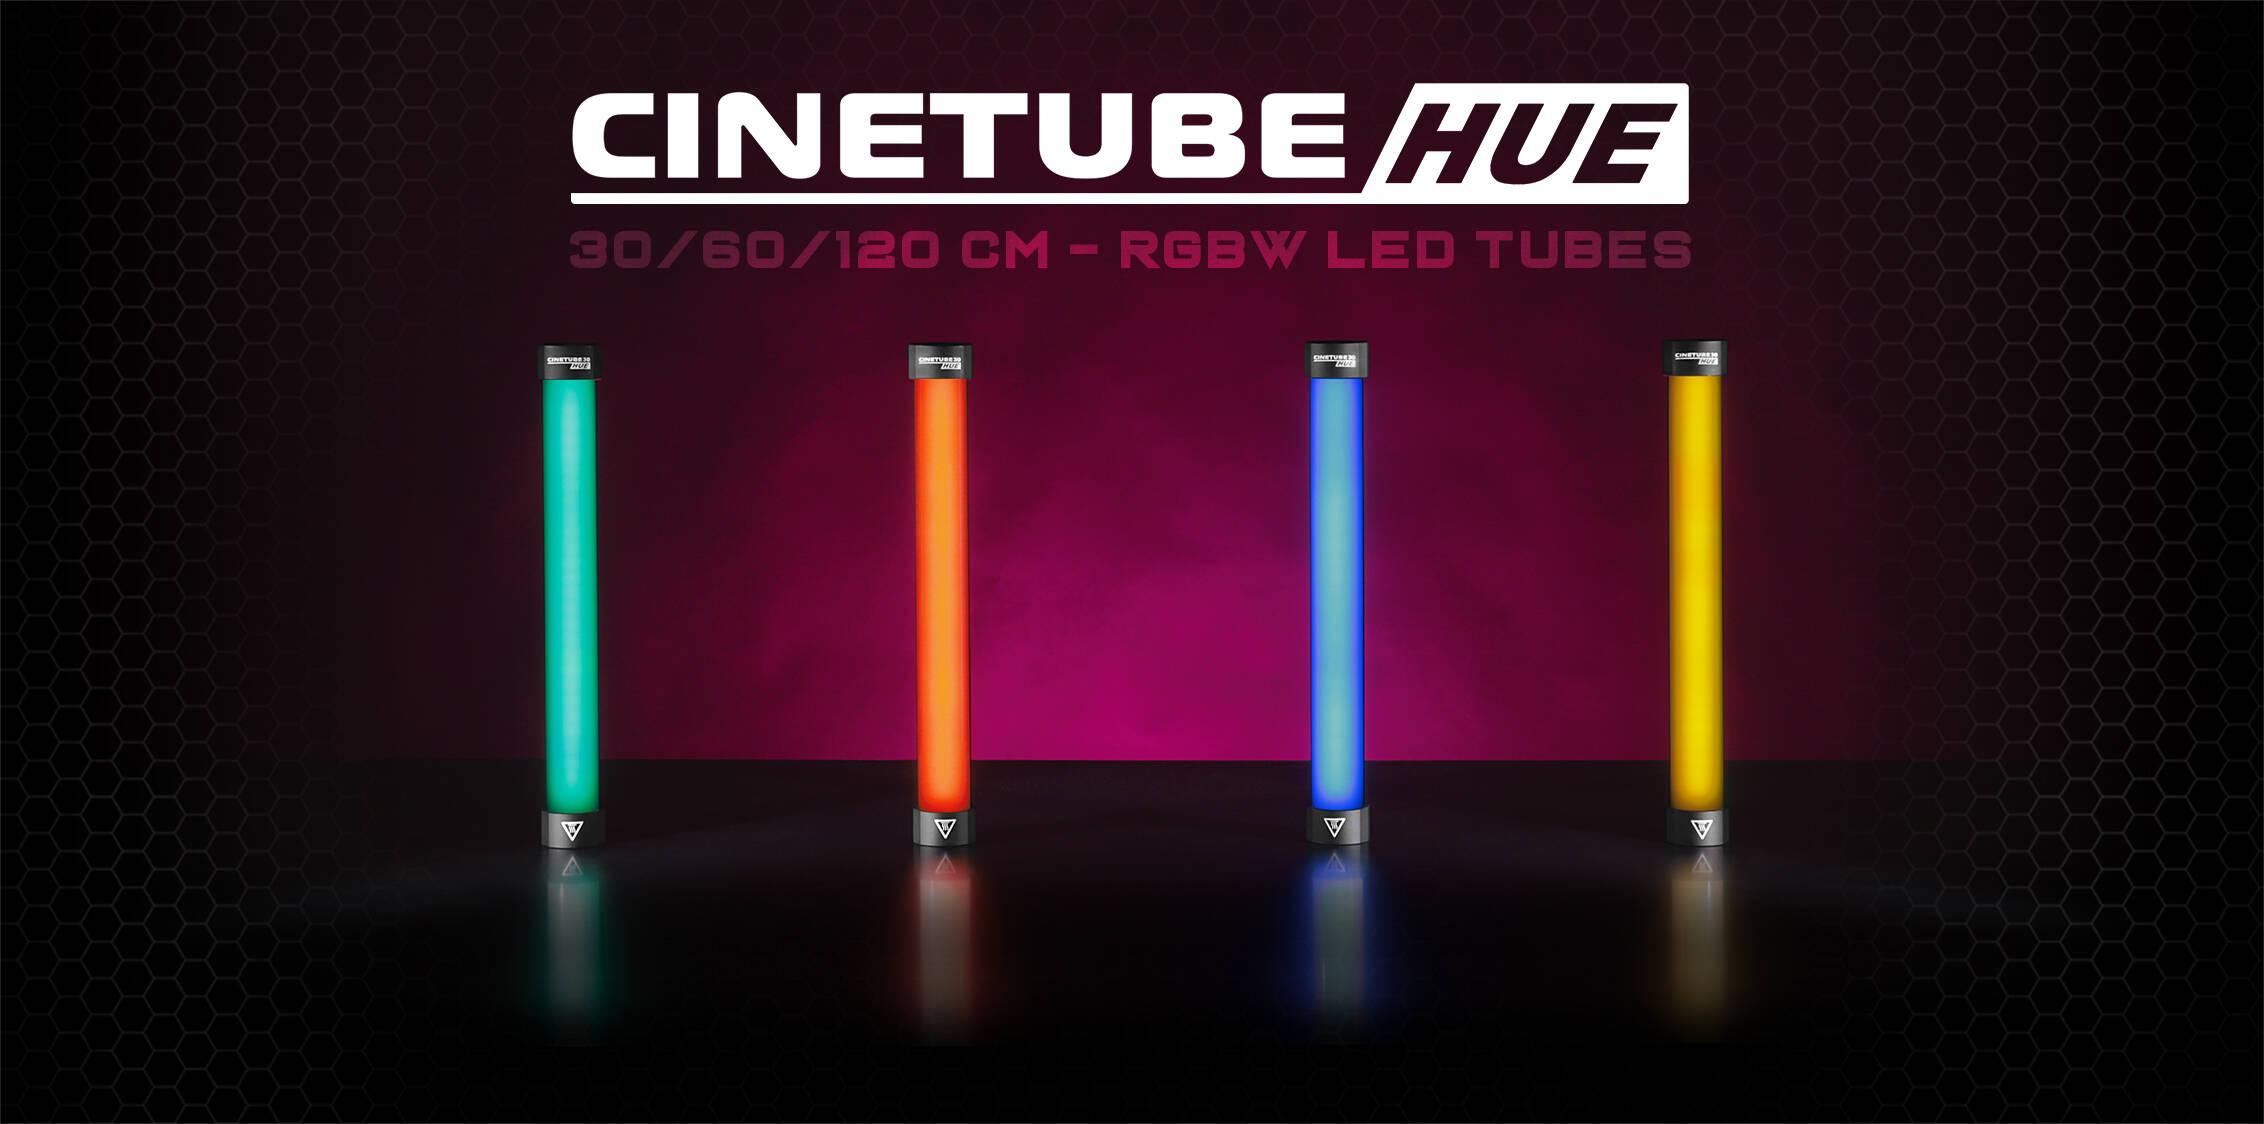 CineTUBE HUE